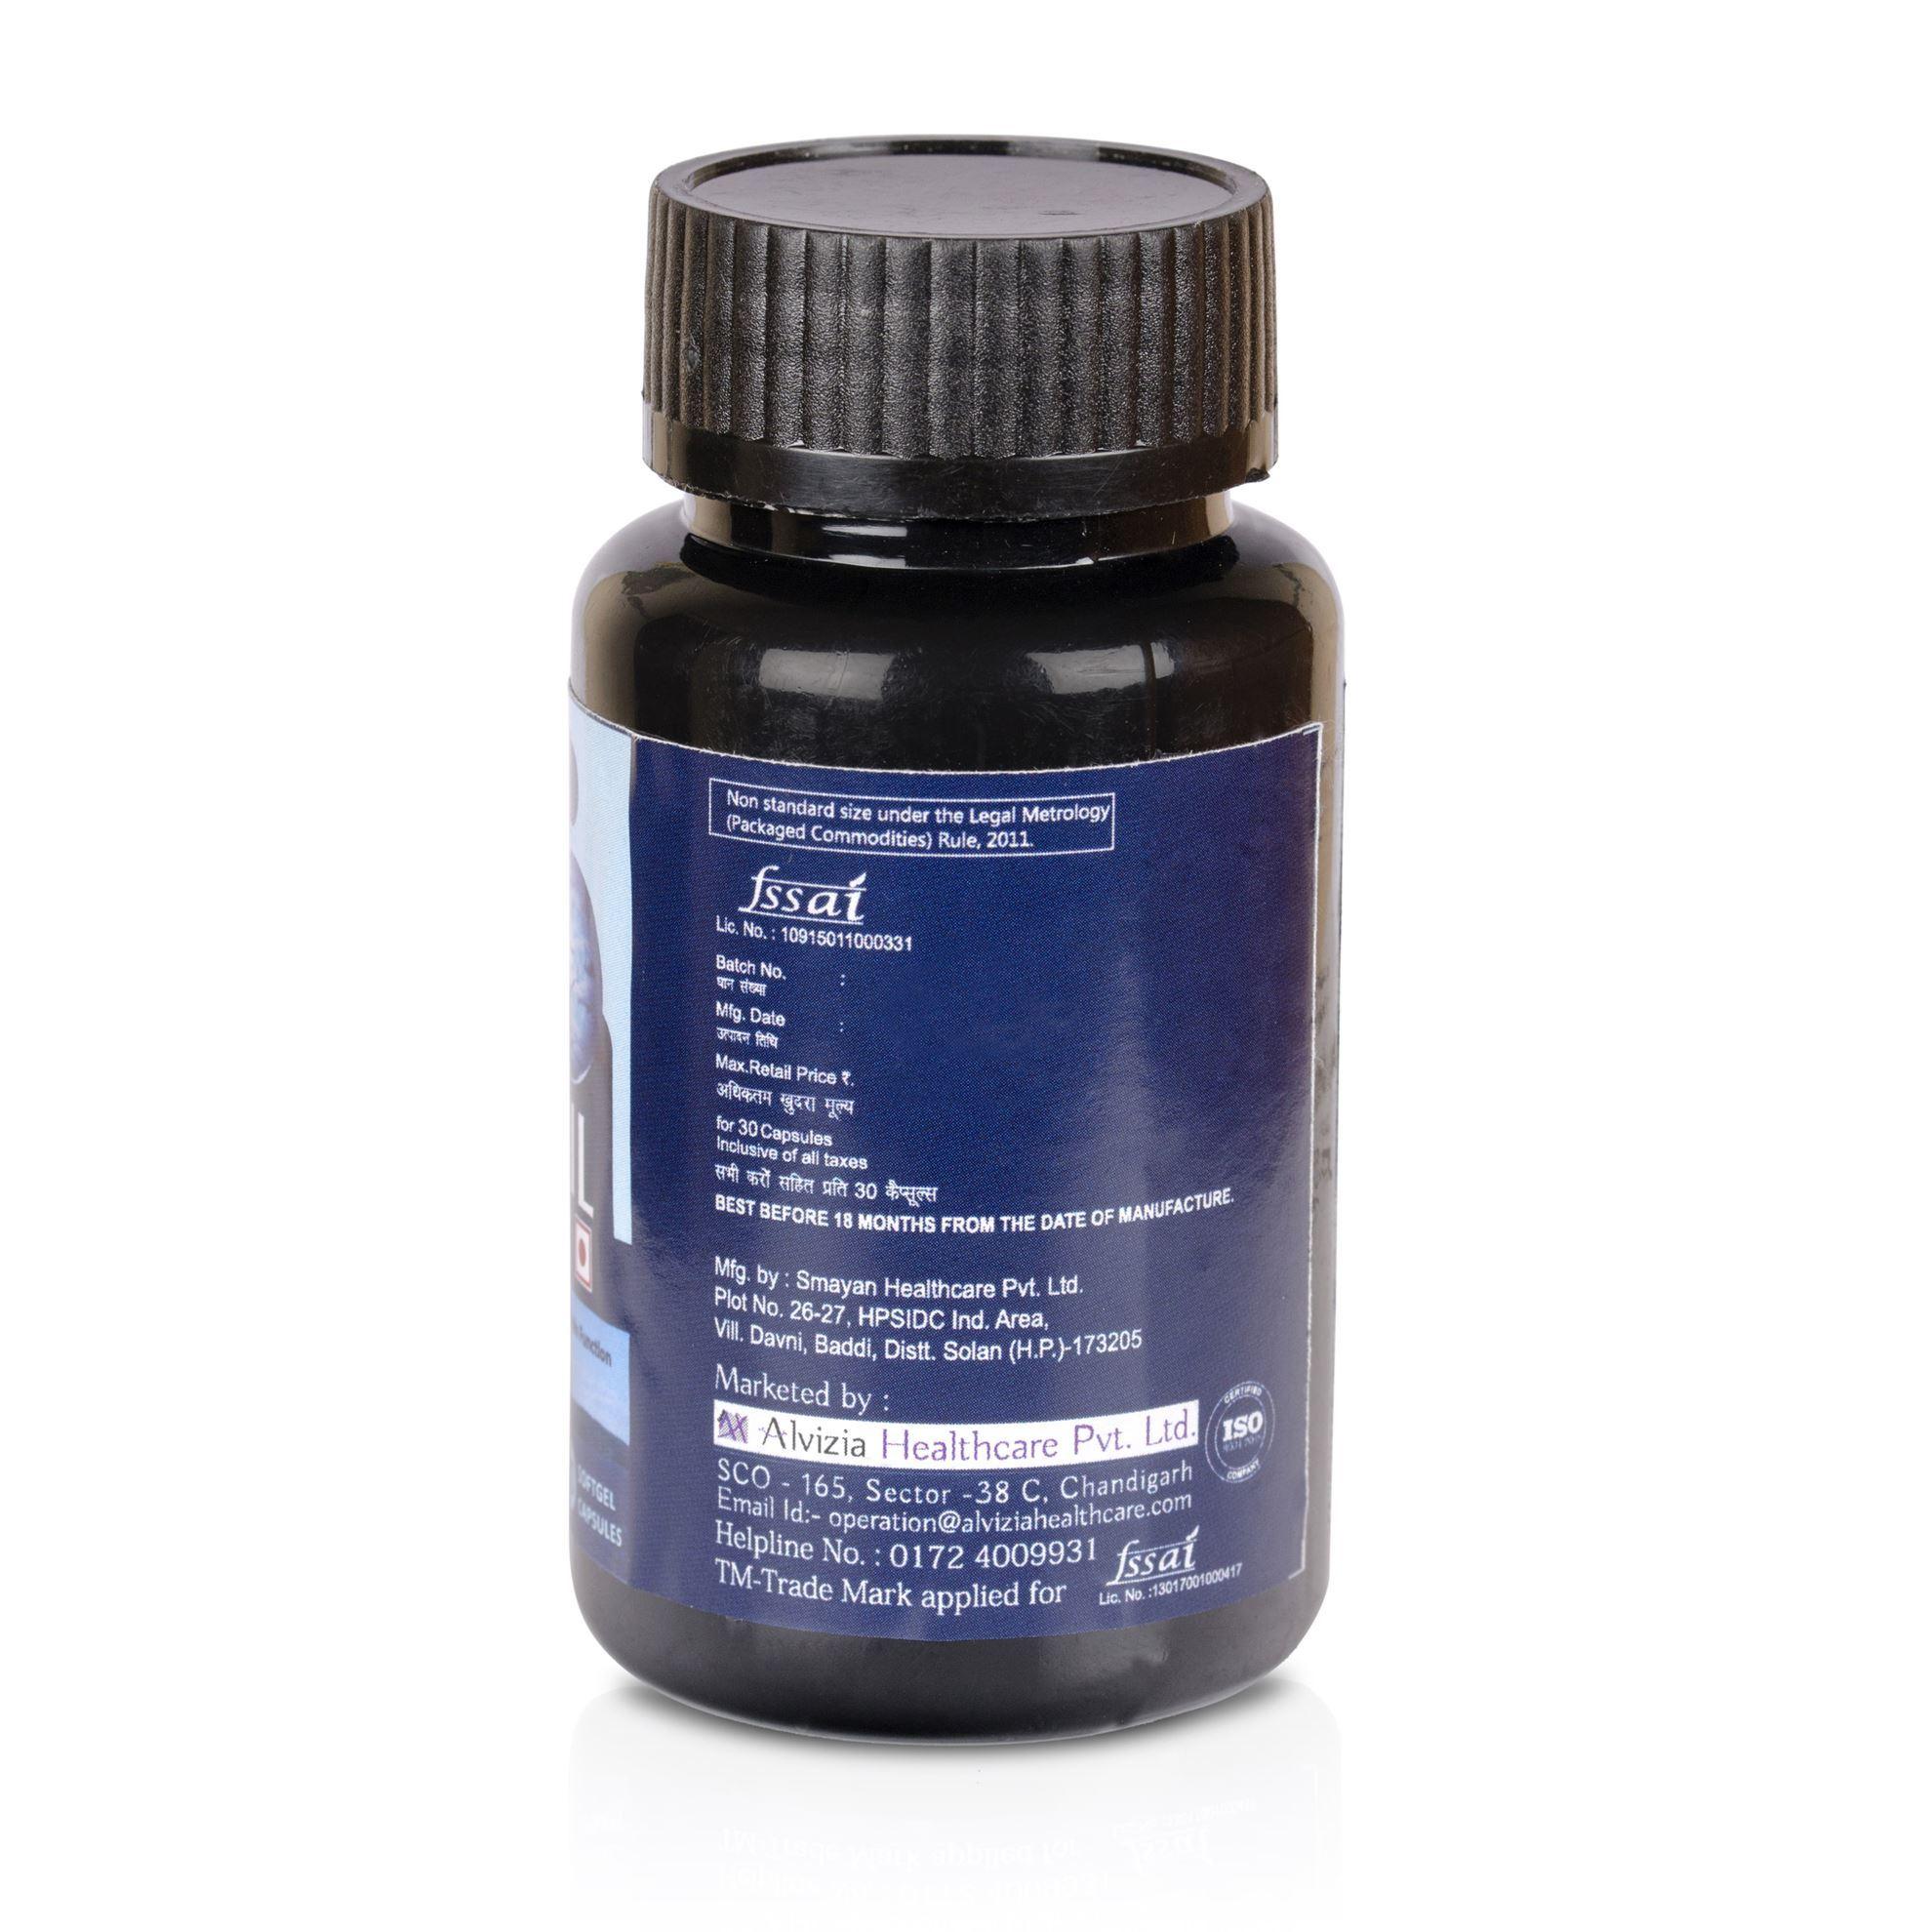 Picture of Alvizia Omega 3 Fish Oil 1000 mg Softgel 30 Capsules